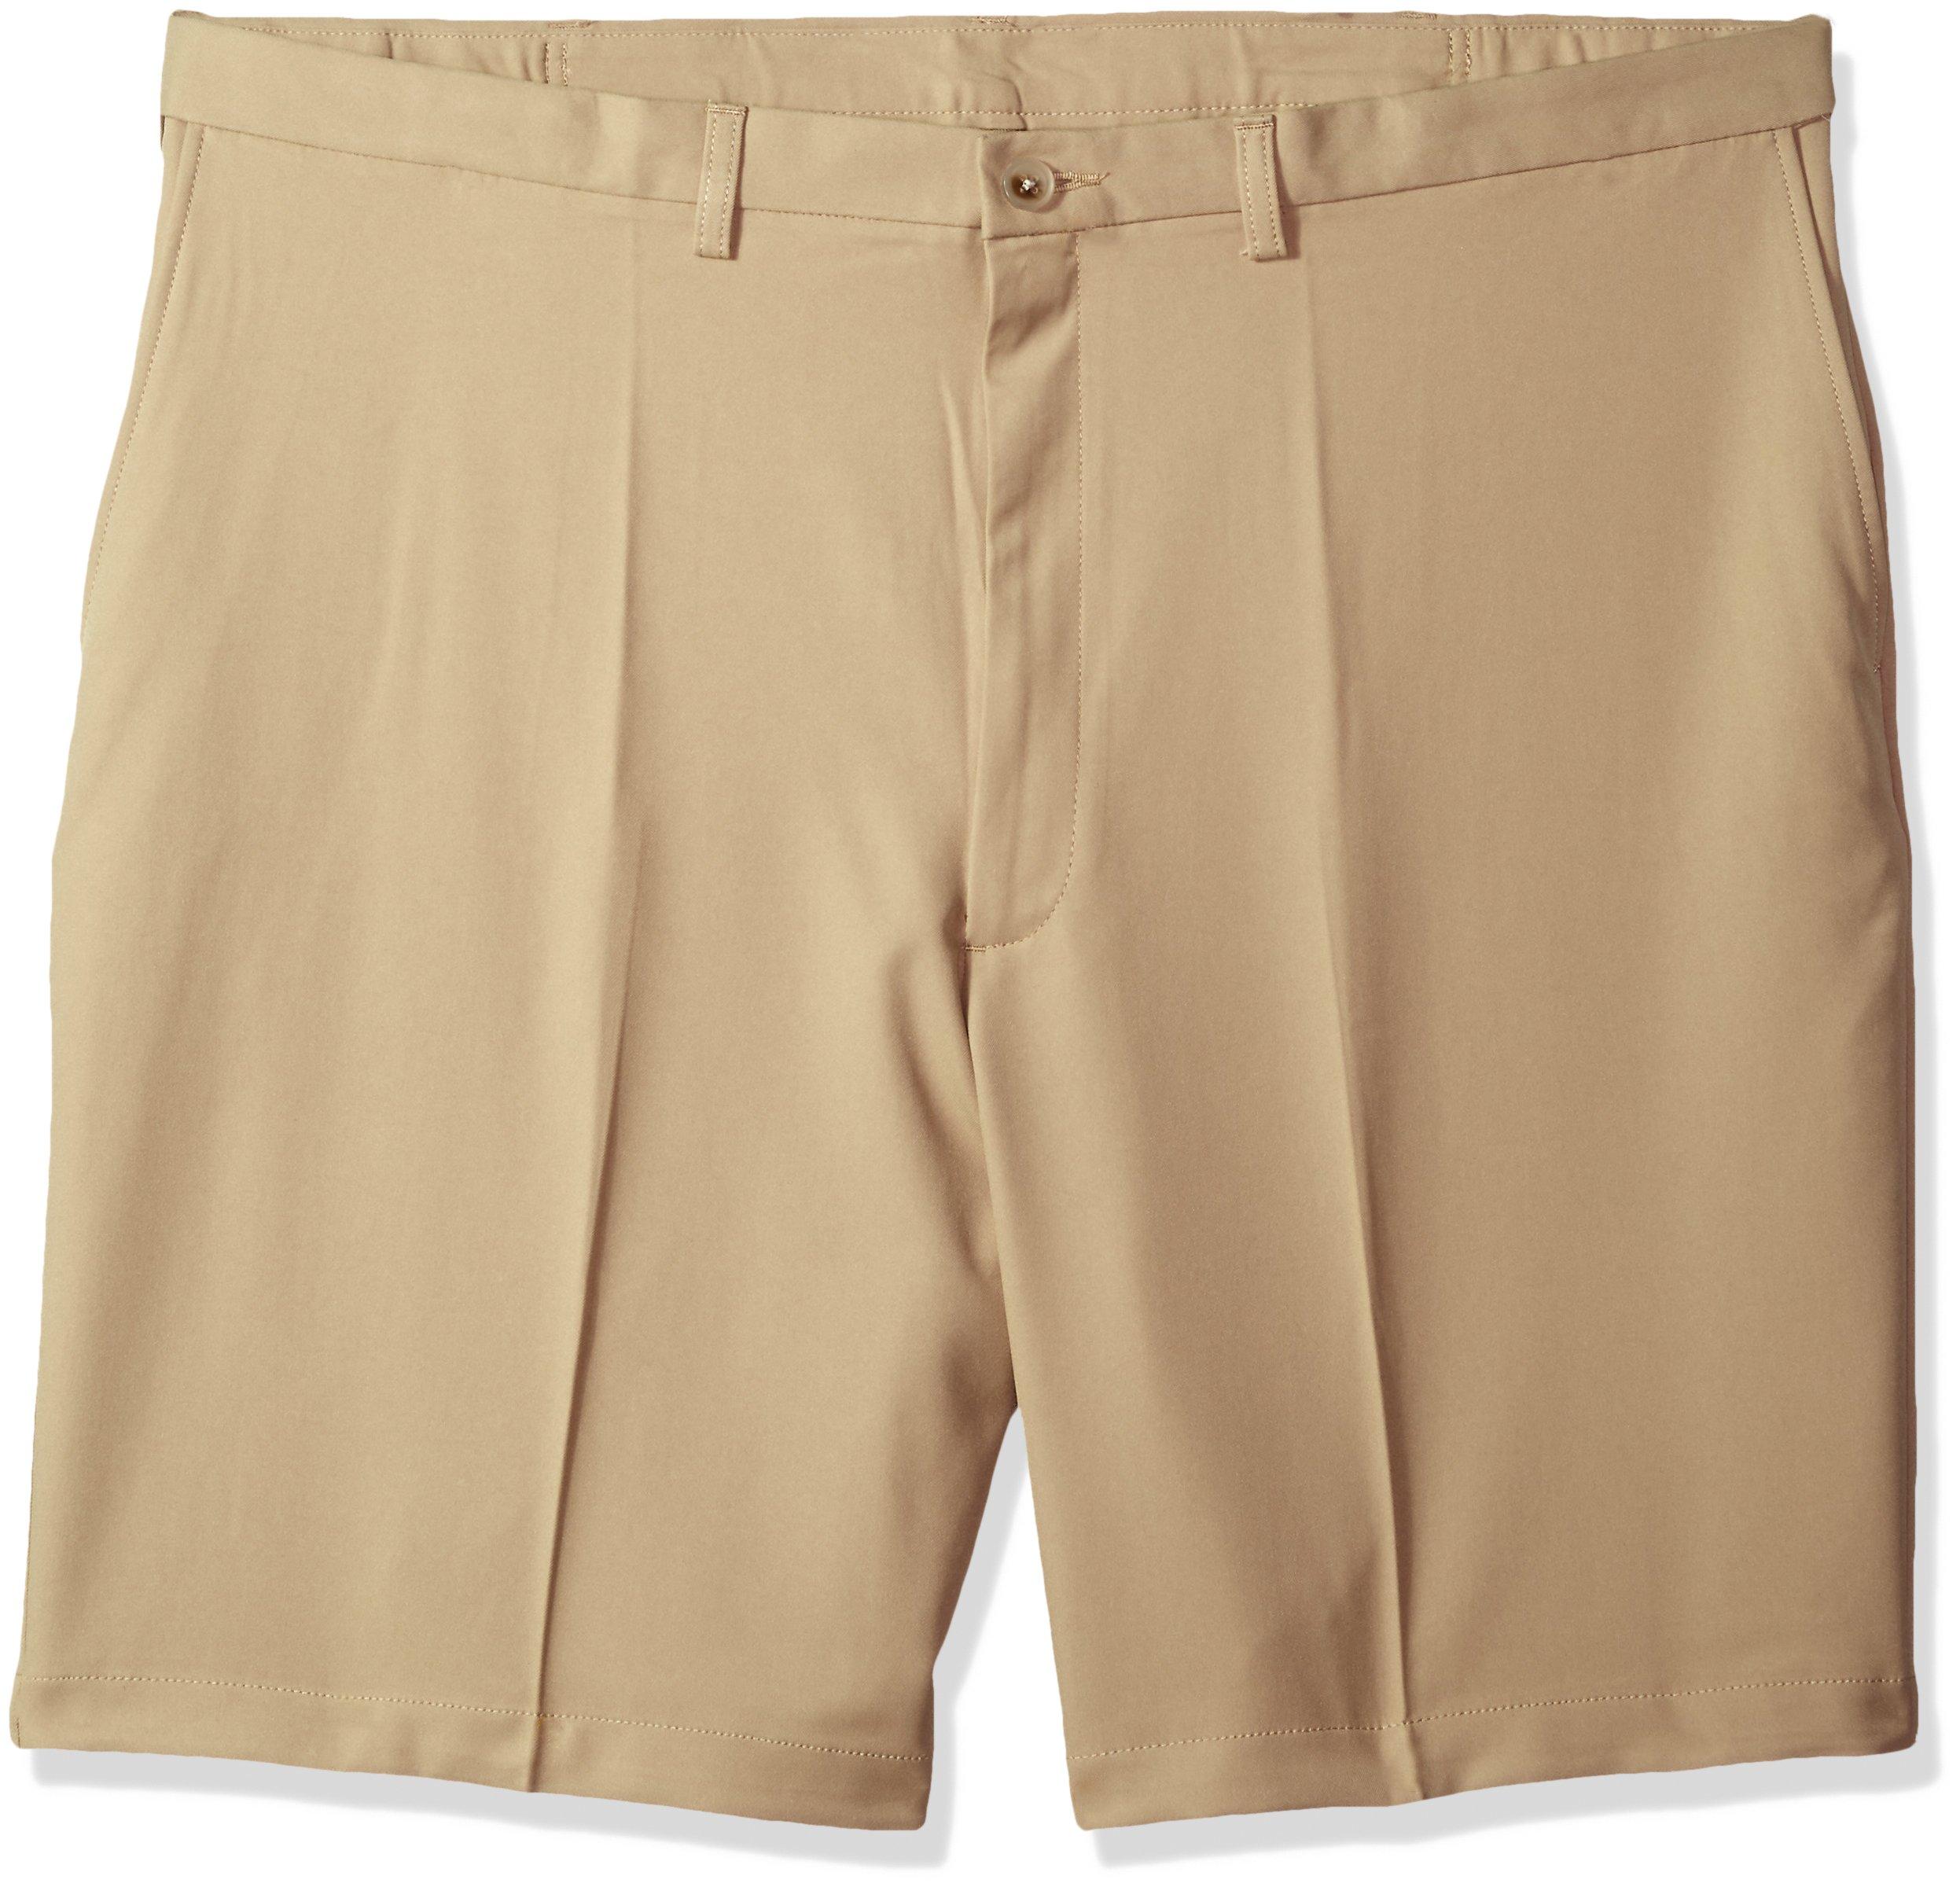 Haggar Men's Big and Tall Cool 18 Pro Classic Fit Stretch Flat Front Short, Khaki, 48